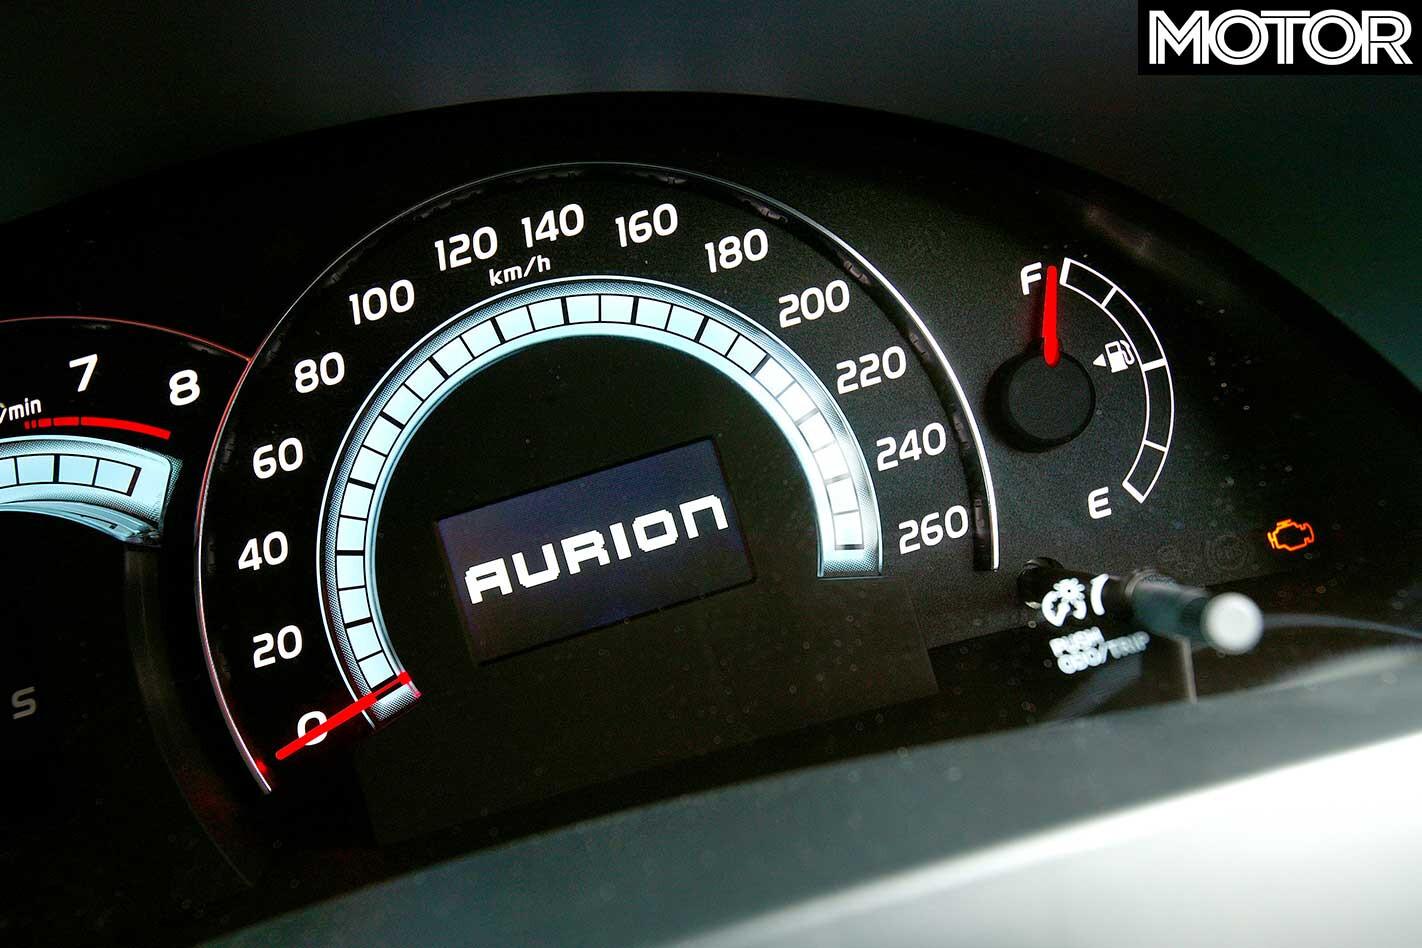 2006 Toyota Aurion Instrumentation Jpg